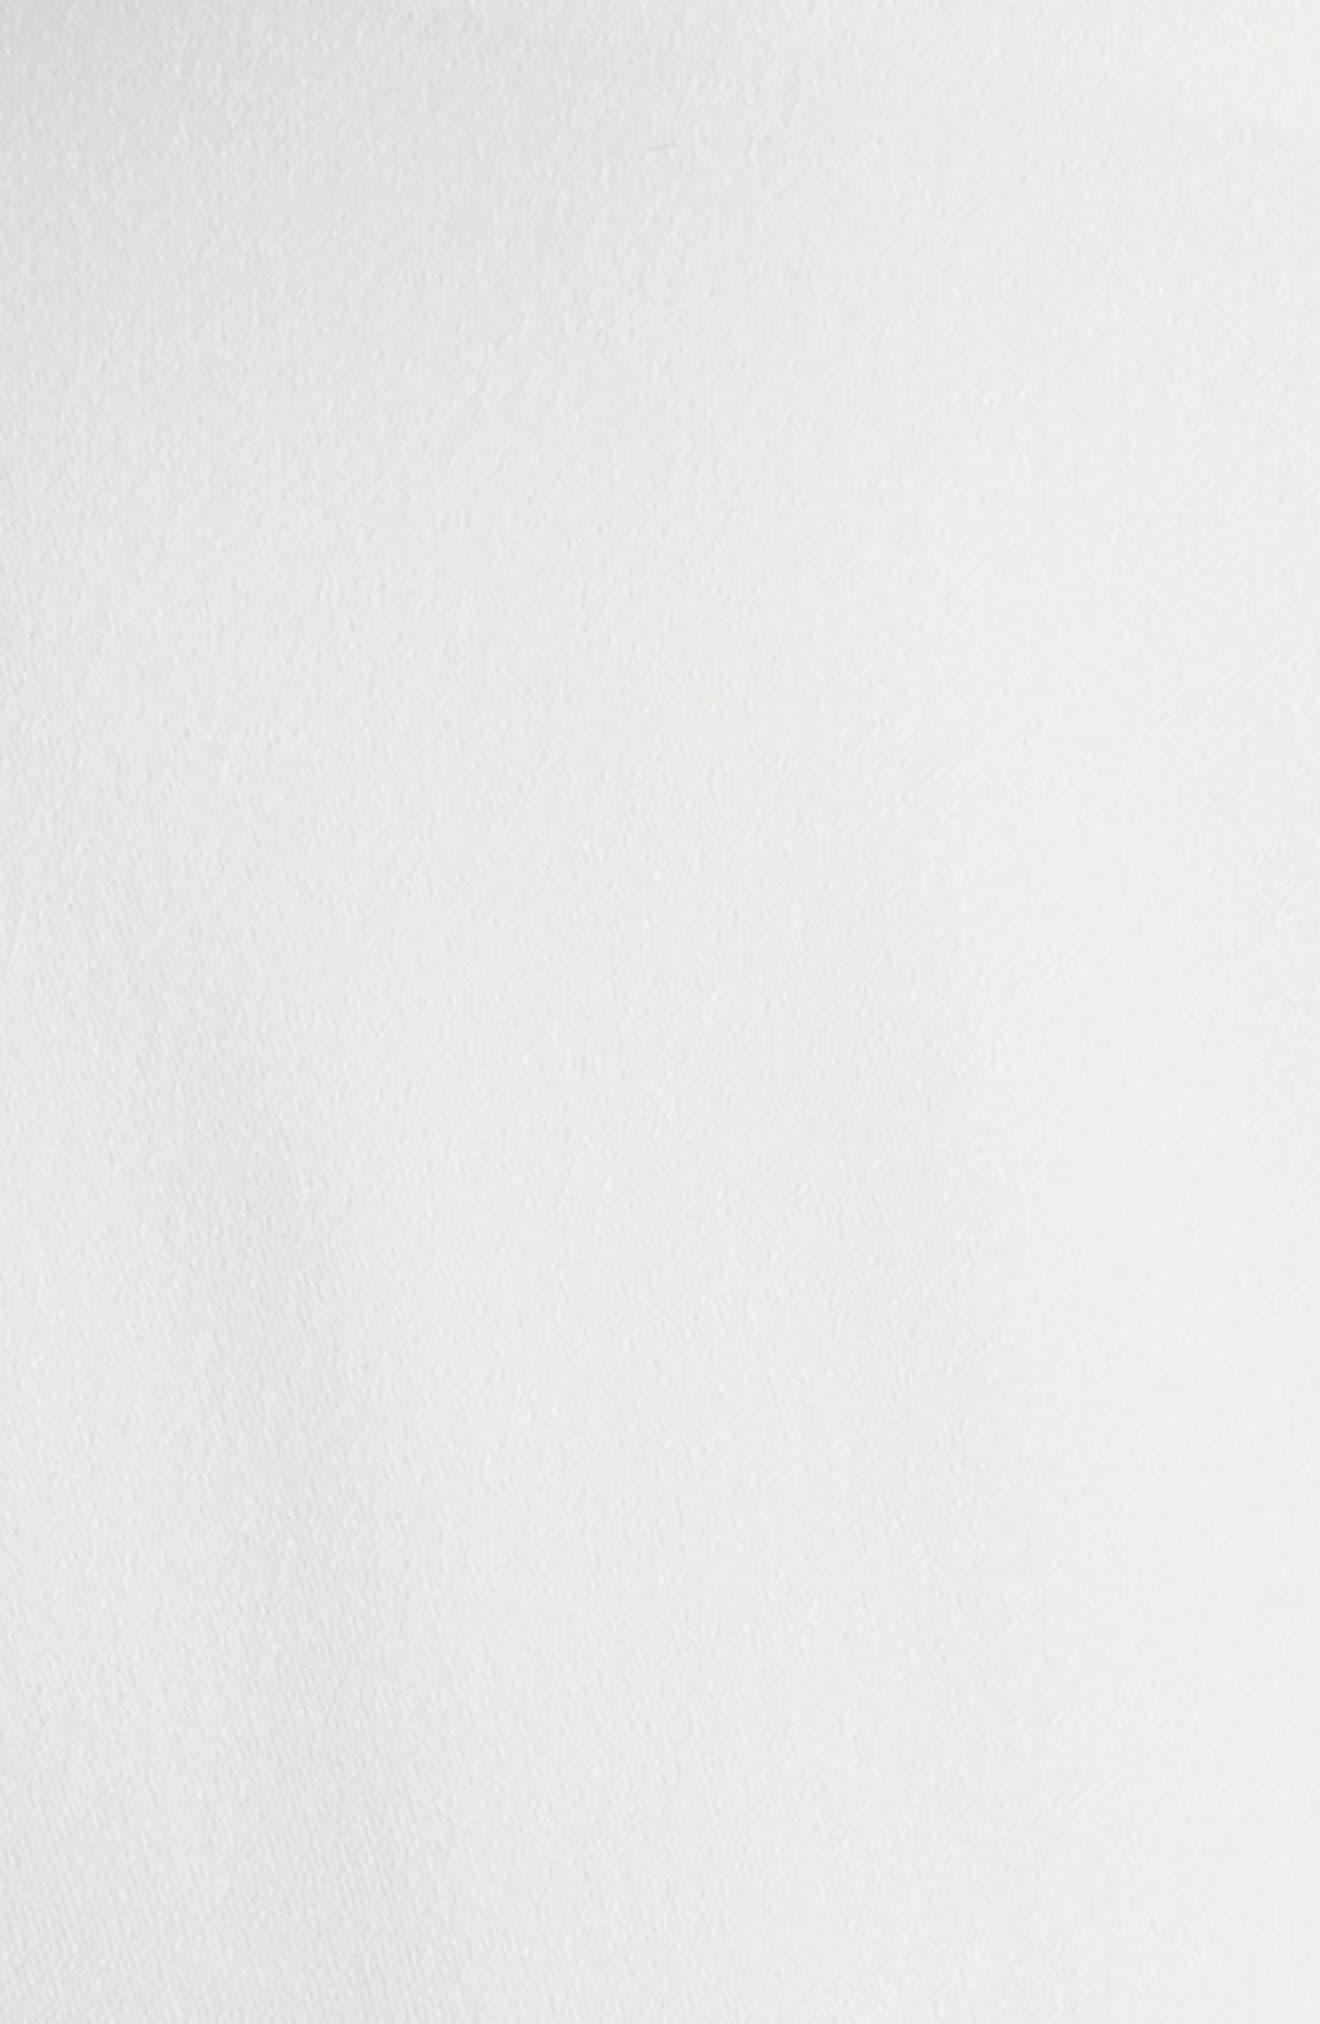 TED BAKER LONDON,                             Blenheim Palace Embellished Body-Con Dress,                             Alternate thumbnail 5, color,                             253